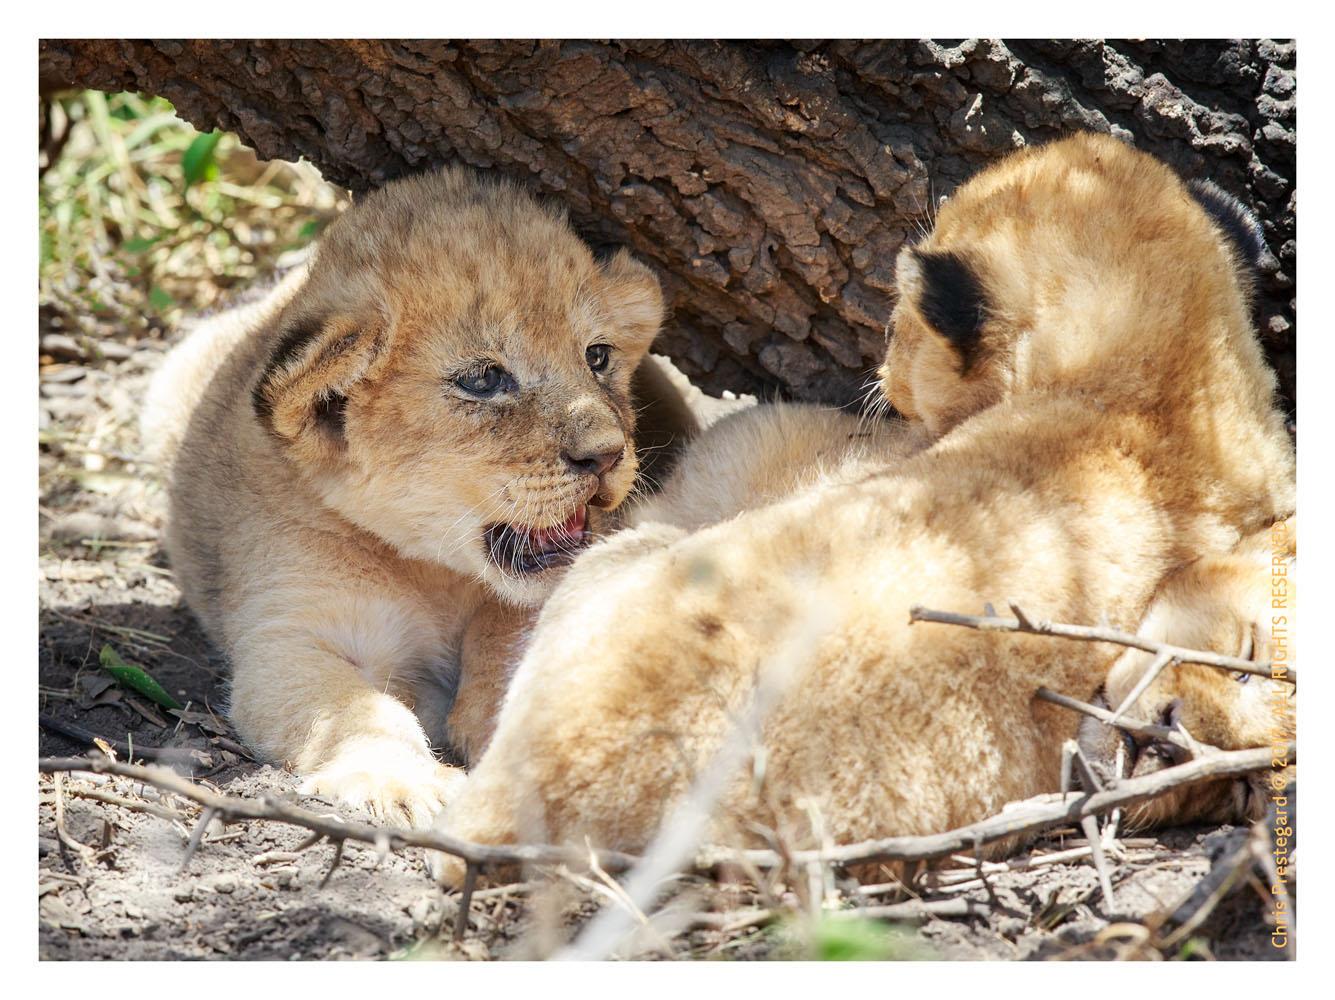 Lions at Ndutu, Tanzania Feb. 2017